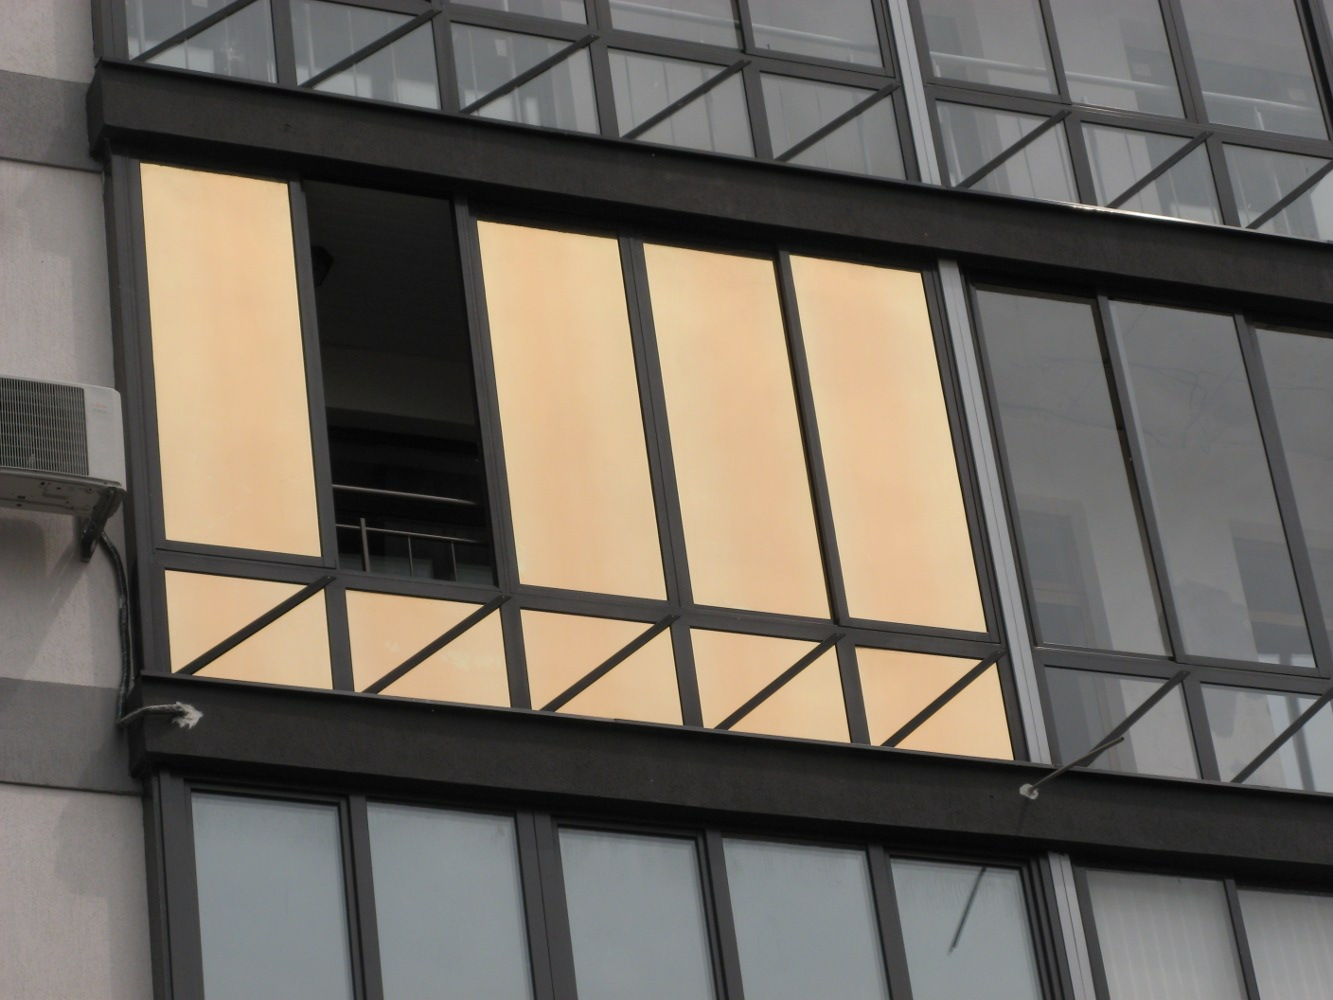 Зеркальные стеклопакеты, плюсы и минусы стеклопакетов с зерк.